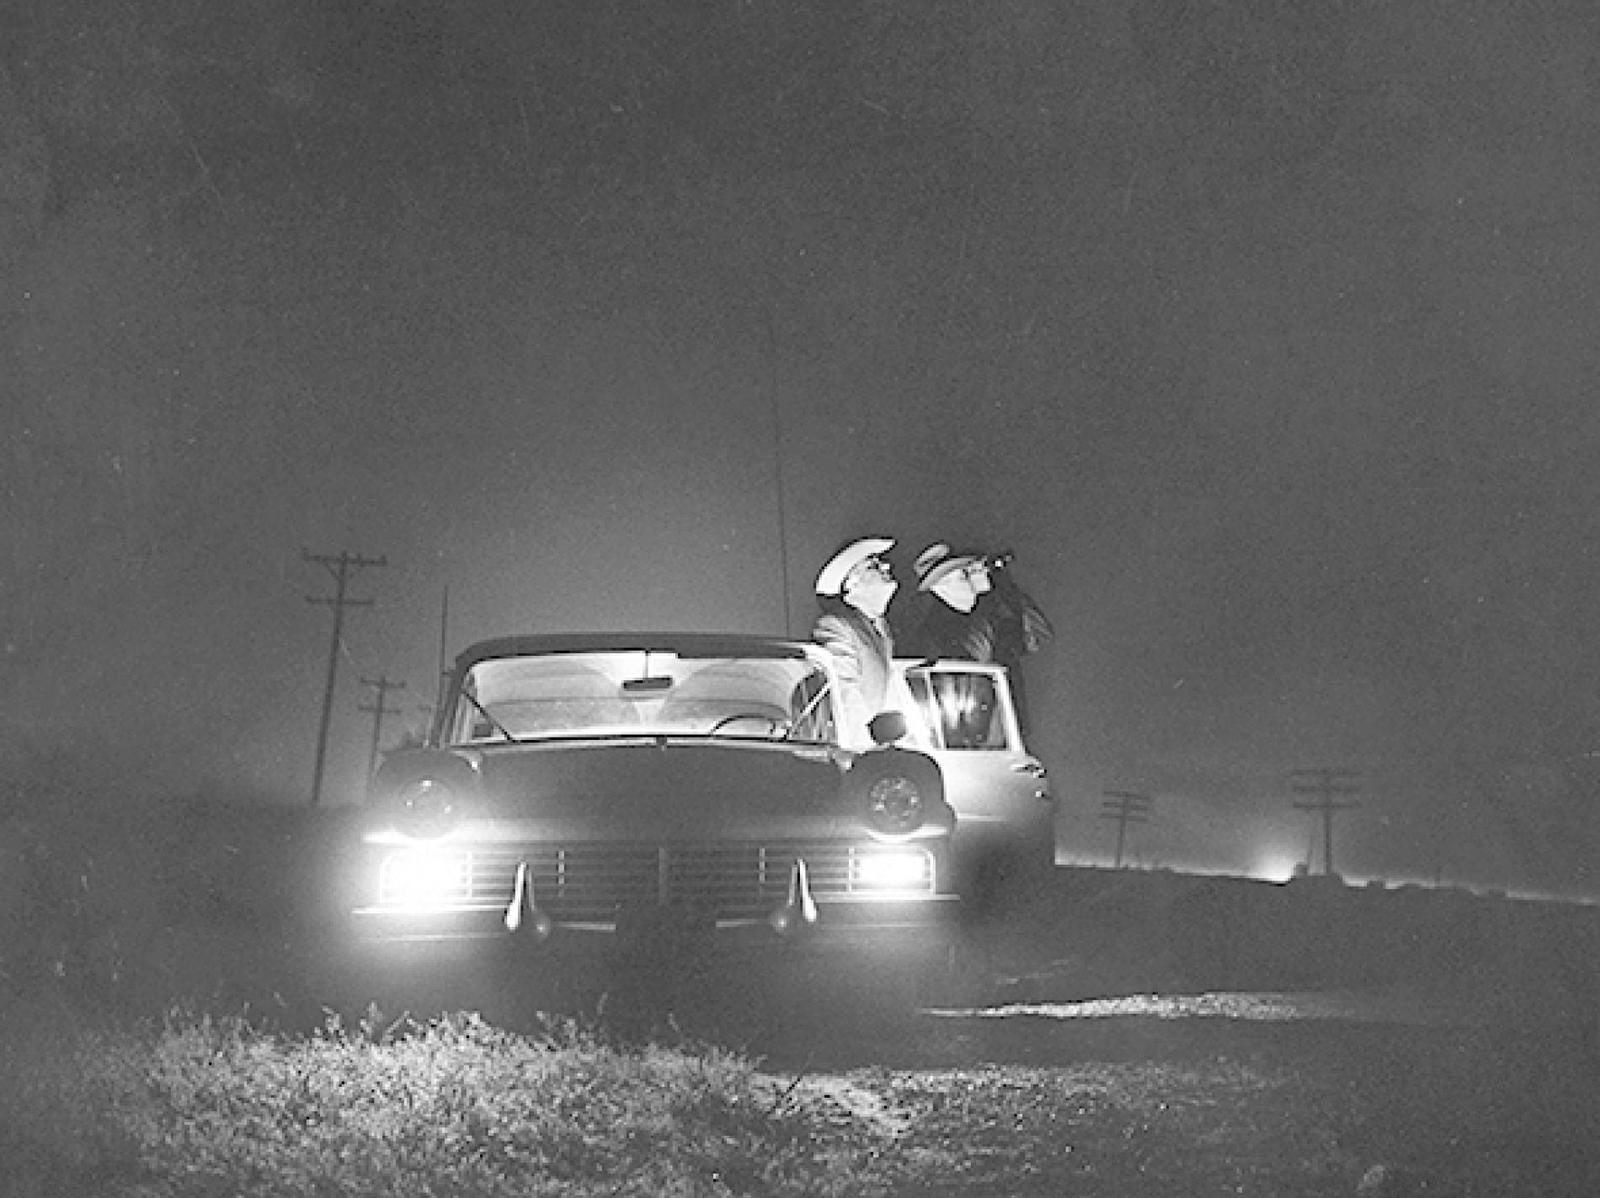 (1957) ovni-ufo l'observation de Levelland Ob_543be5_police-scout-for-signs-of-a-flying-sau